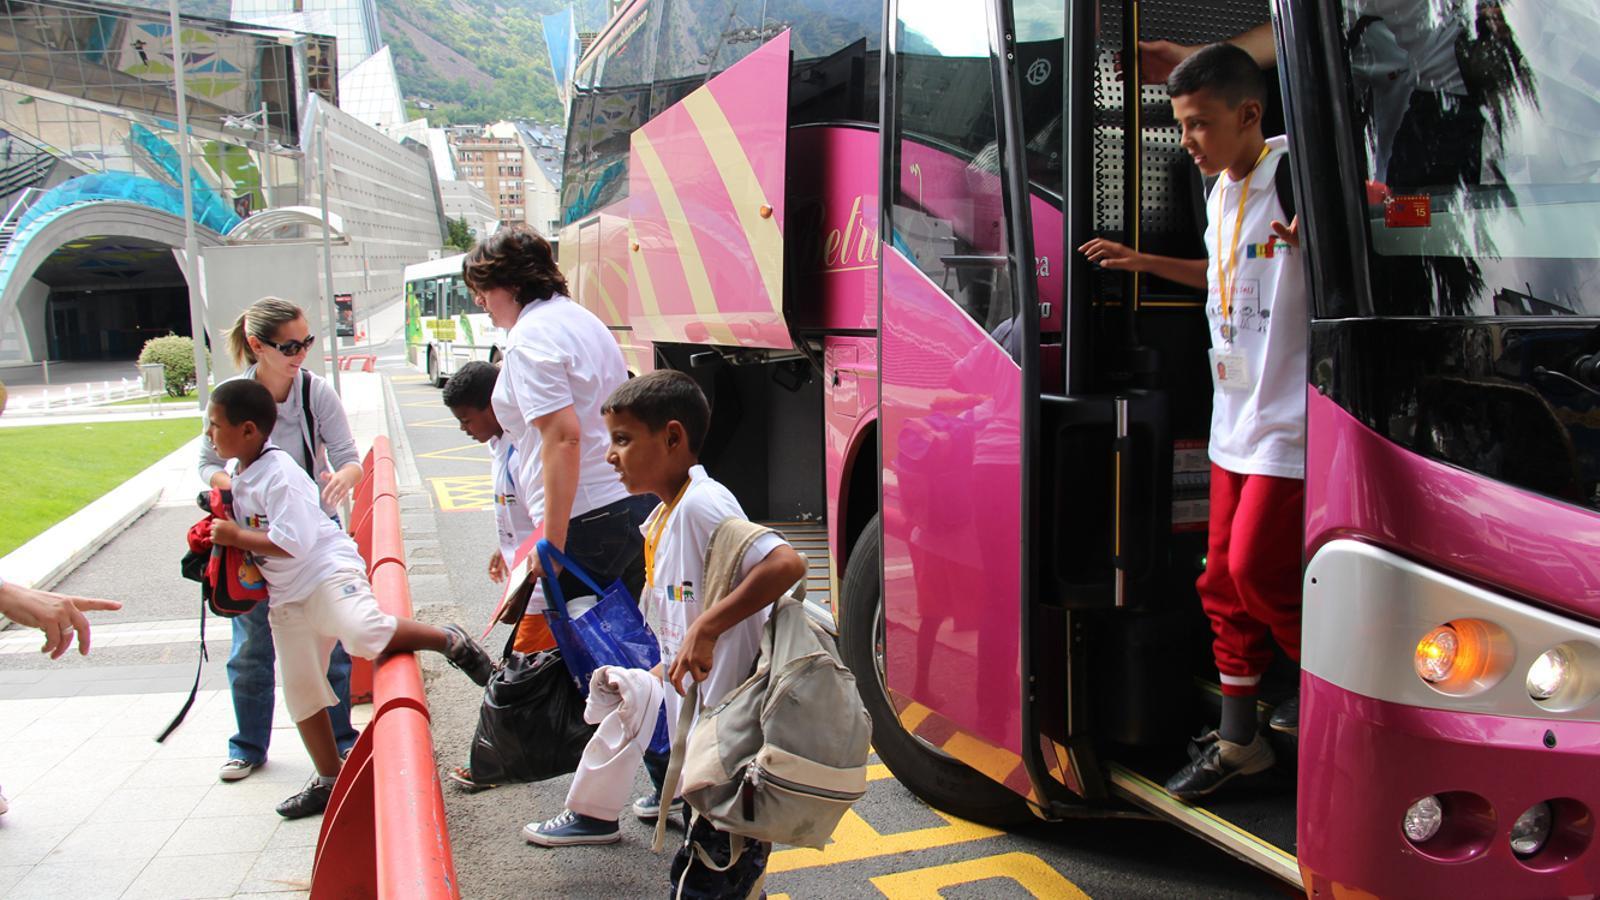 Arribada dels nens sahrauís a Andorra / N.M. (ANA)